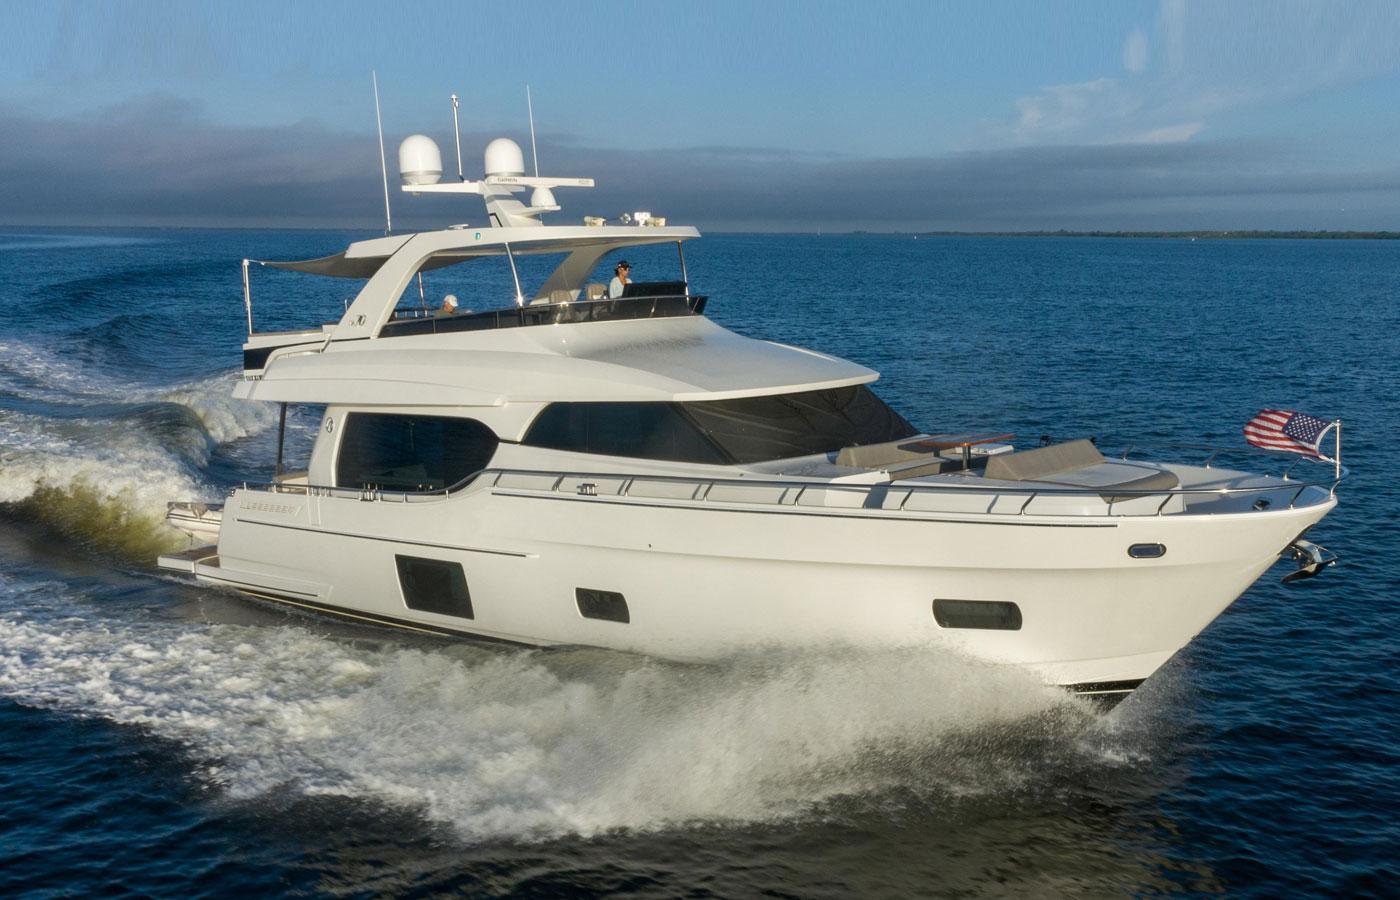 70 Ocean Alexander PLAYBOOK Sold Through In-House Deal